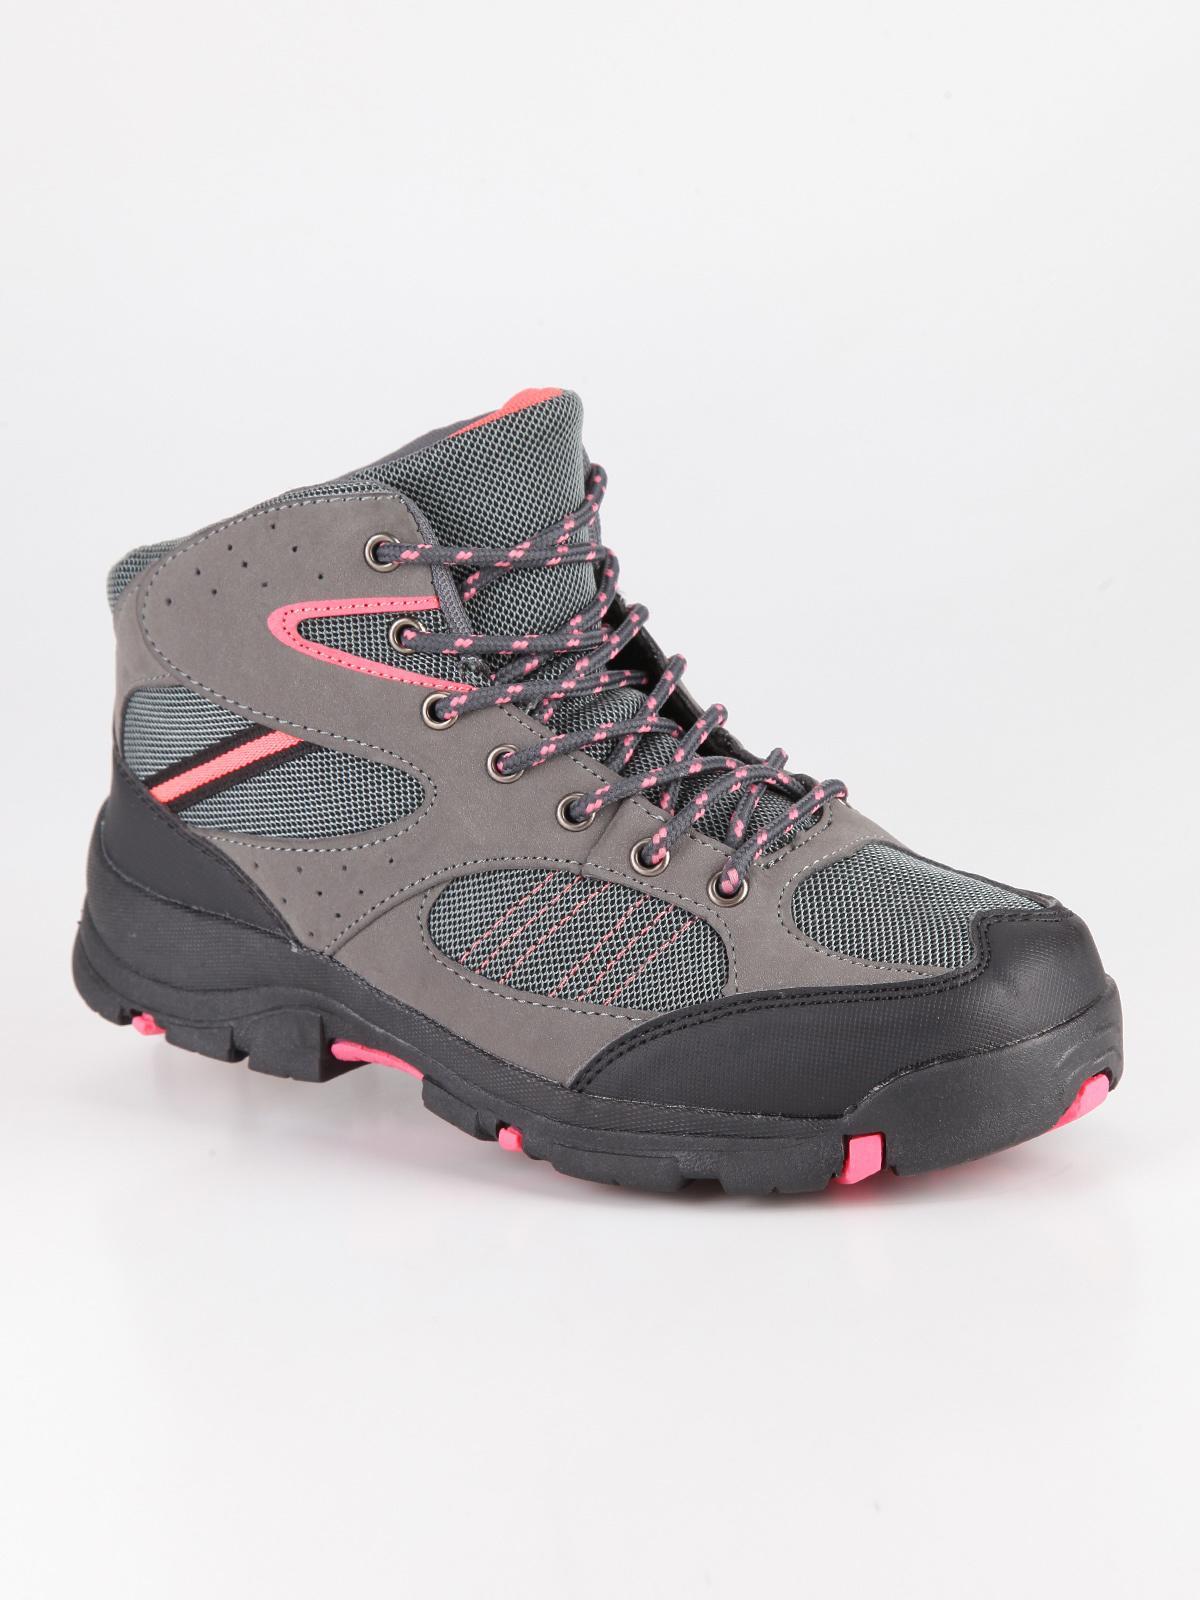 vendita uk bene vari stili oms scarpe e rinaldini.it